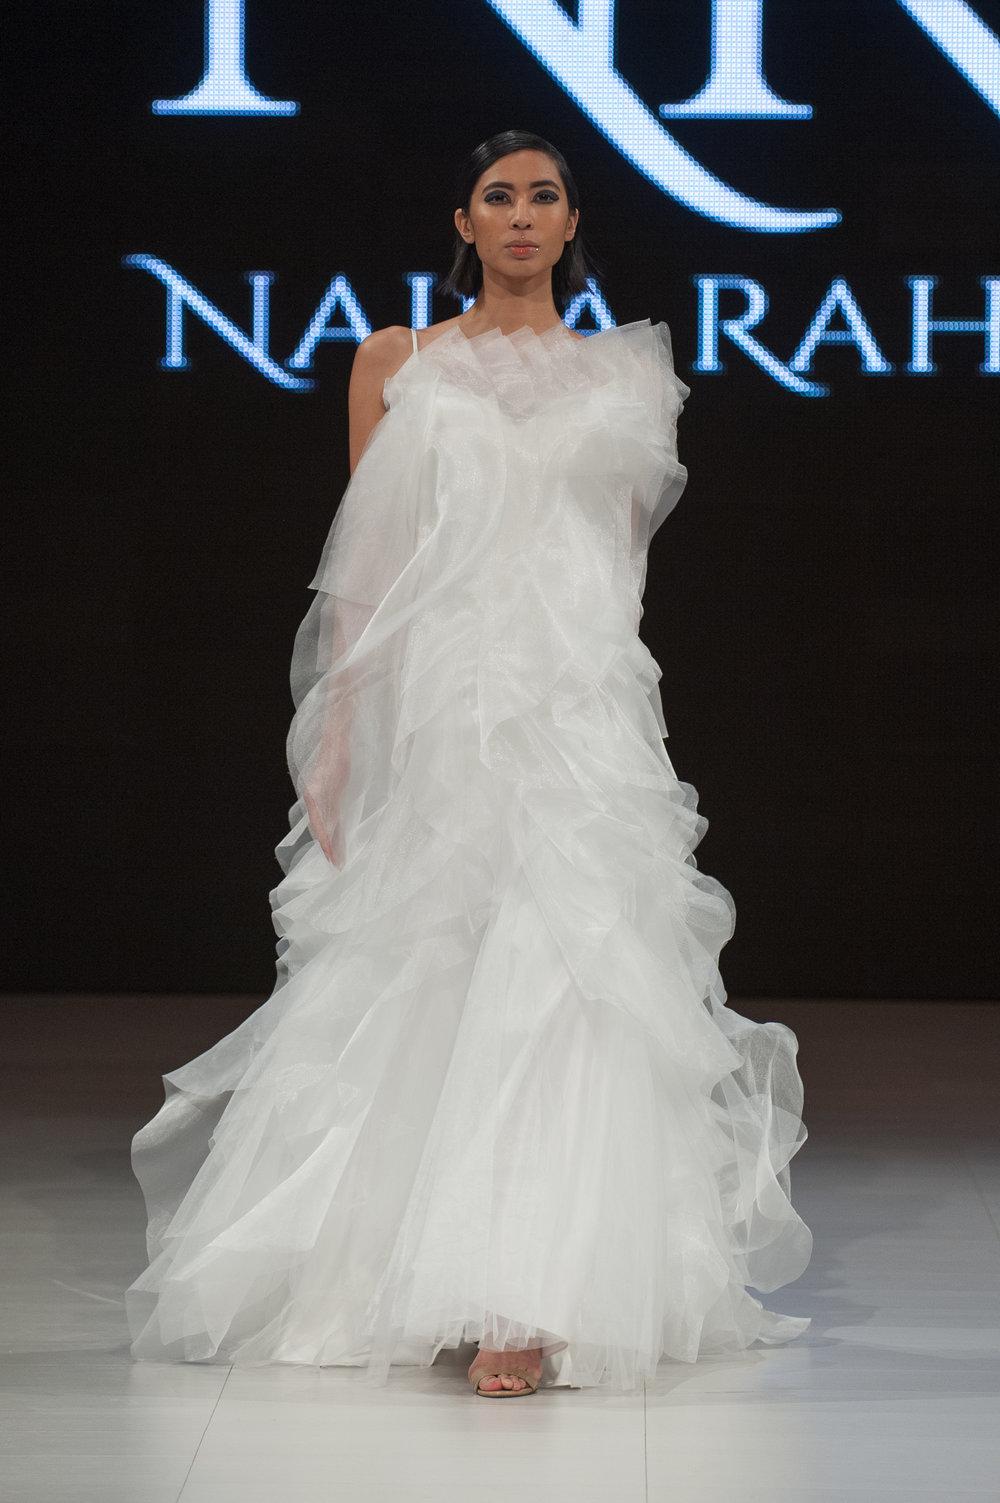 FAT2018-Day1-April17-Najla_Rahimi-Runway-Che_Rosales-LARAWAN-6064.jpg